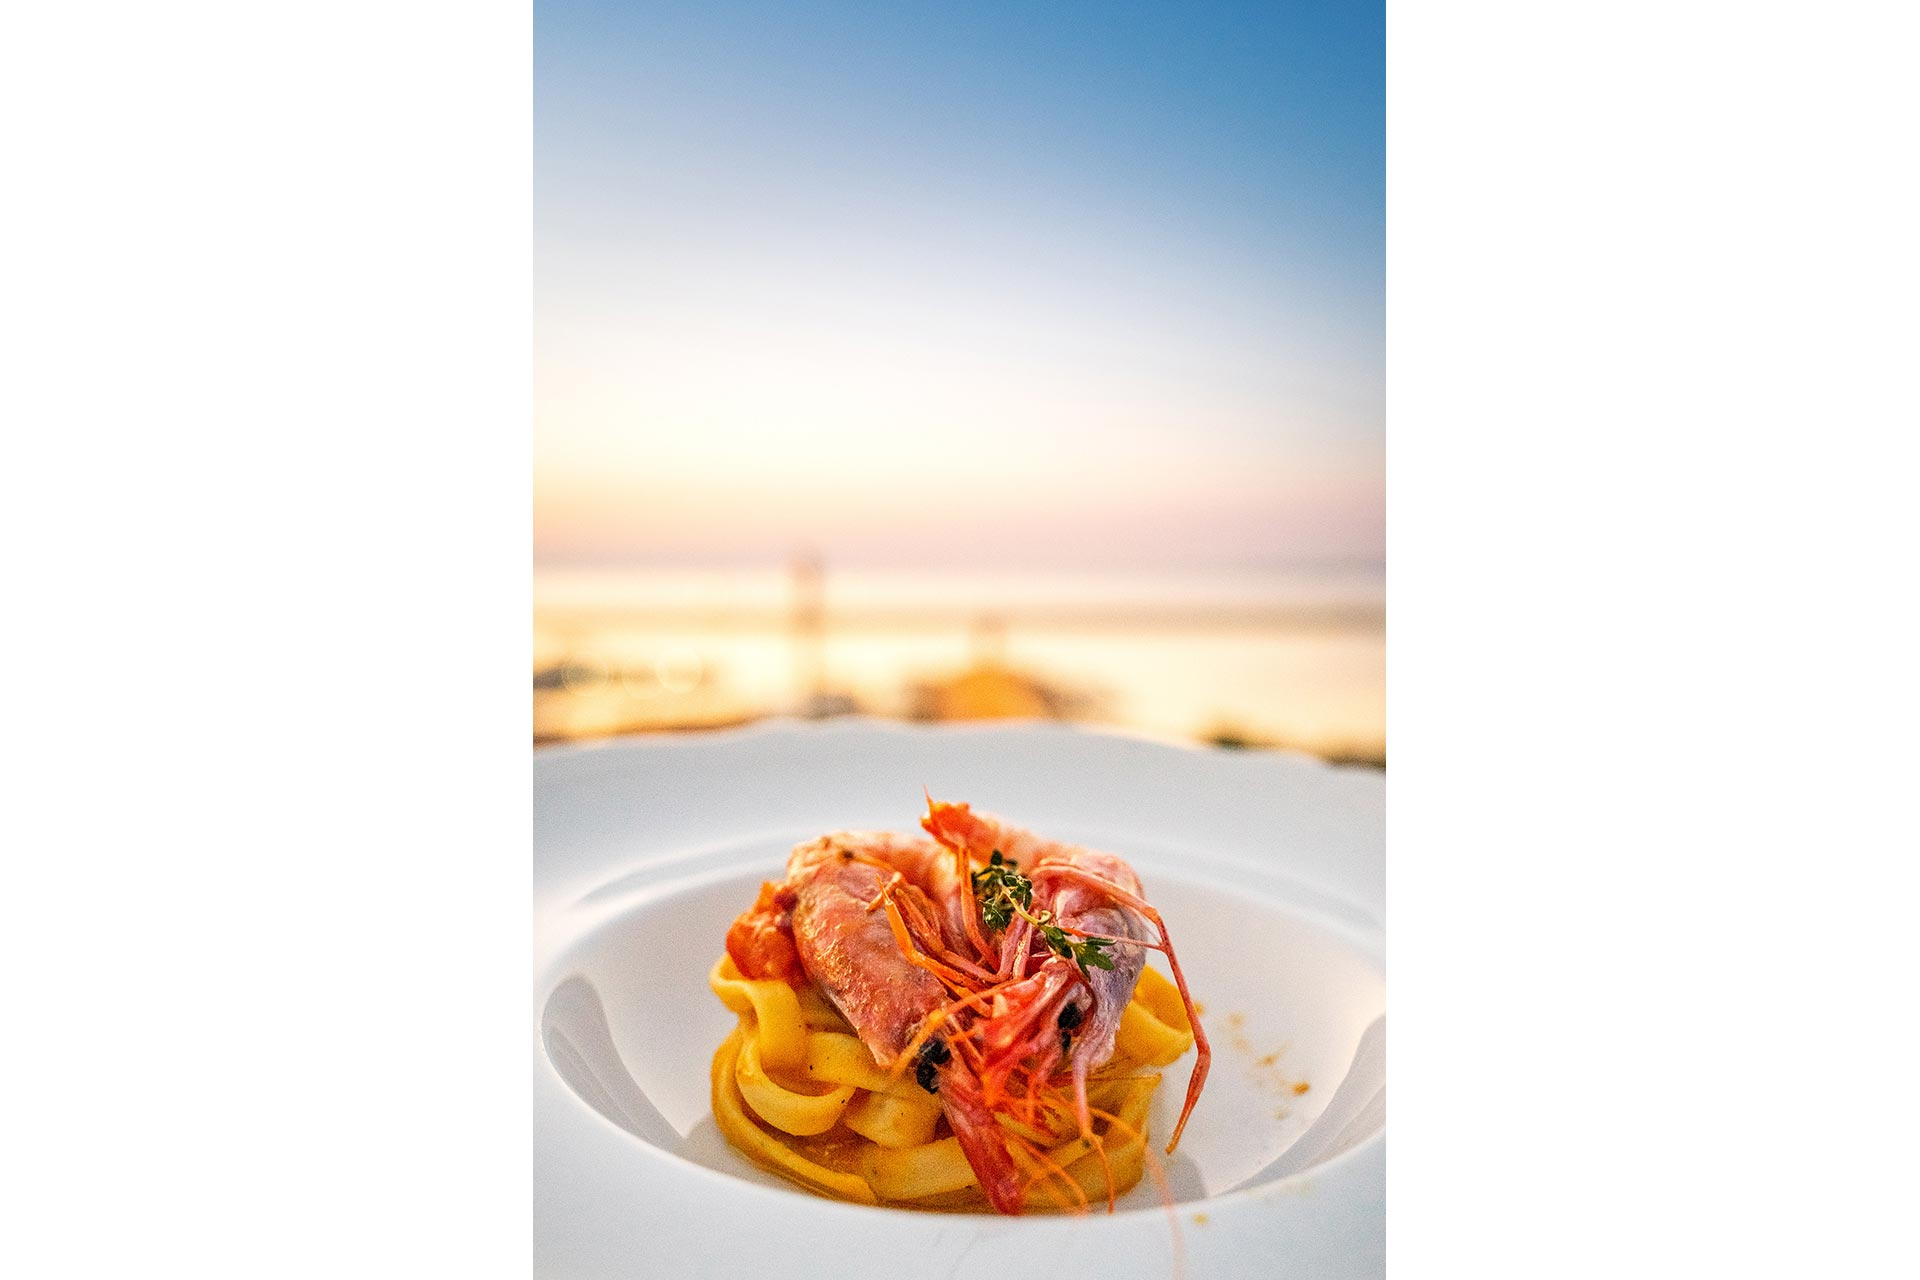 DolceVita Gourmet Restaurant - Gallipoli